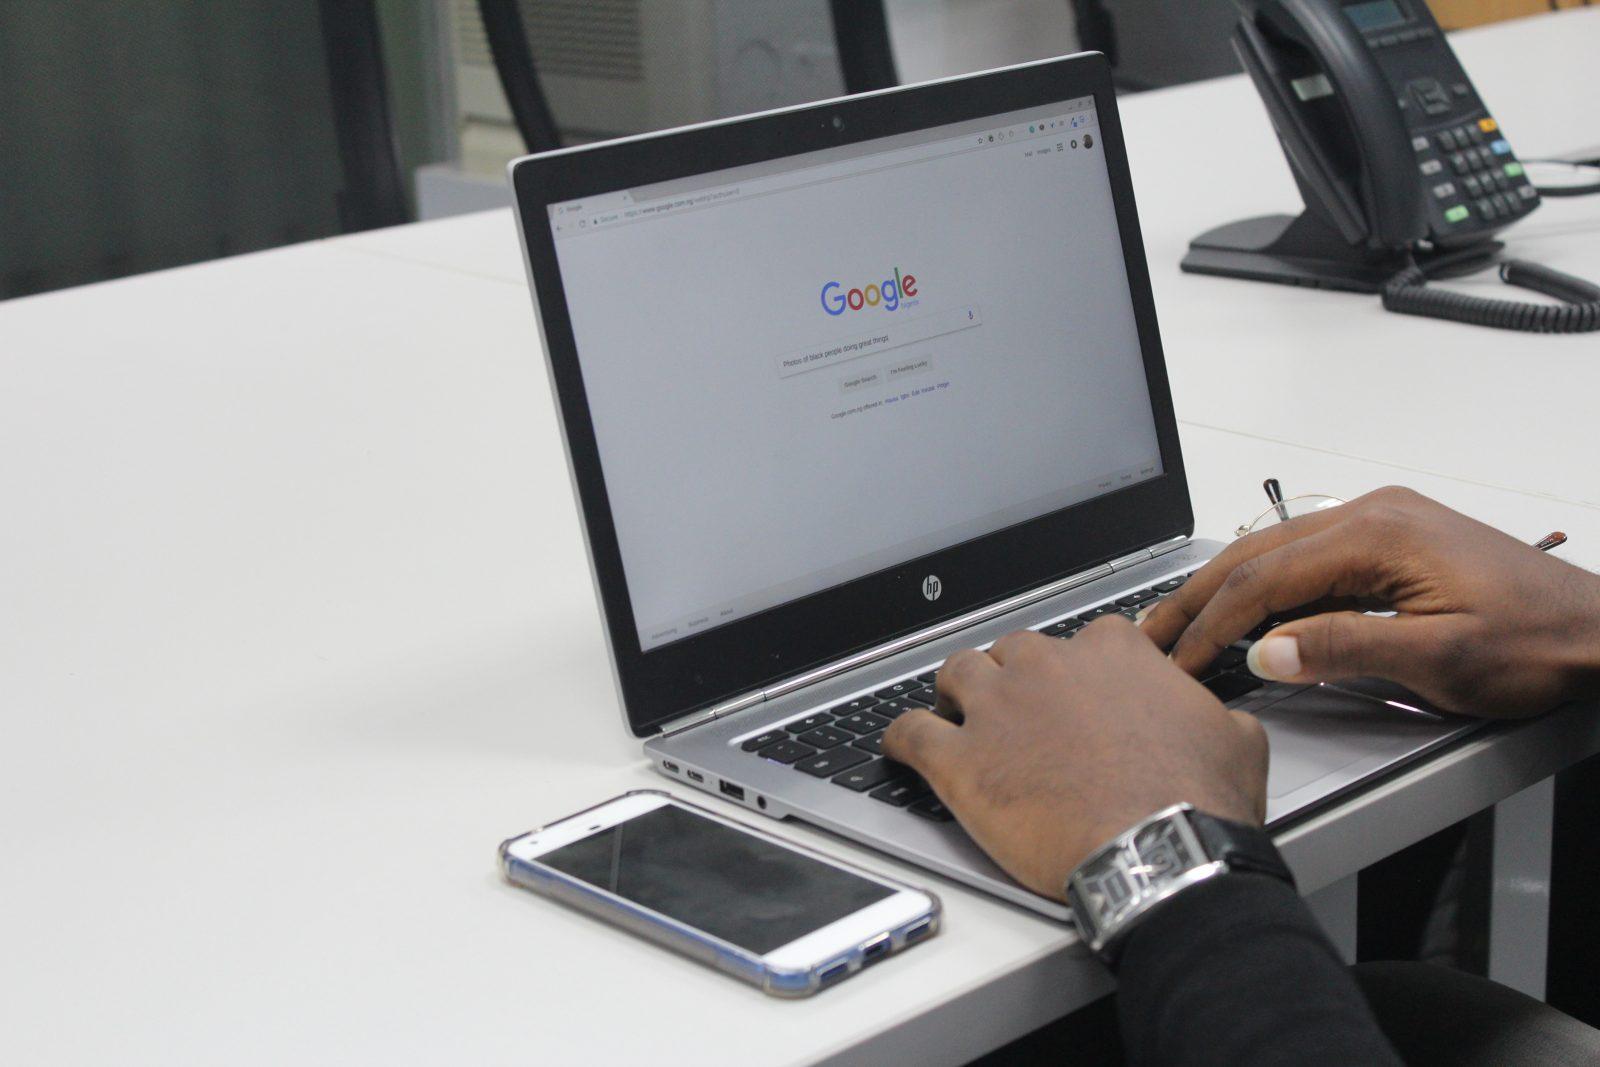 Chromeで「終了するには⌘Qキーを押します」と表示された時の対応方法:Mac